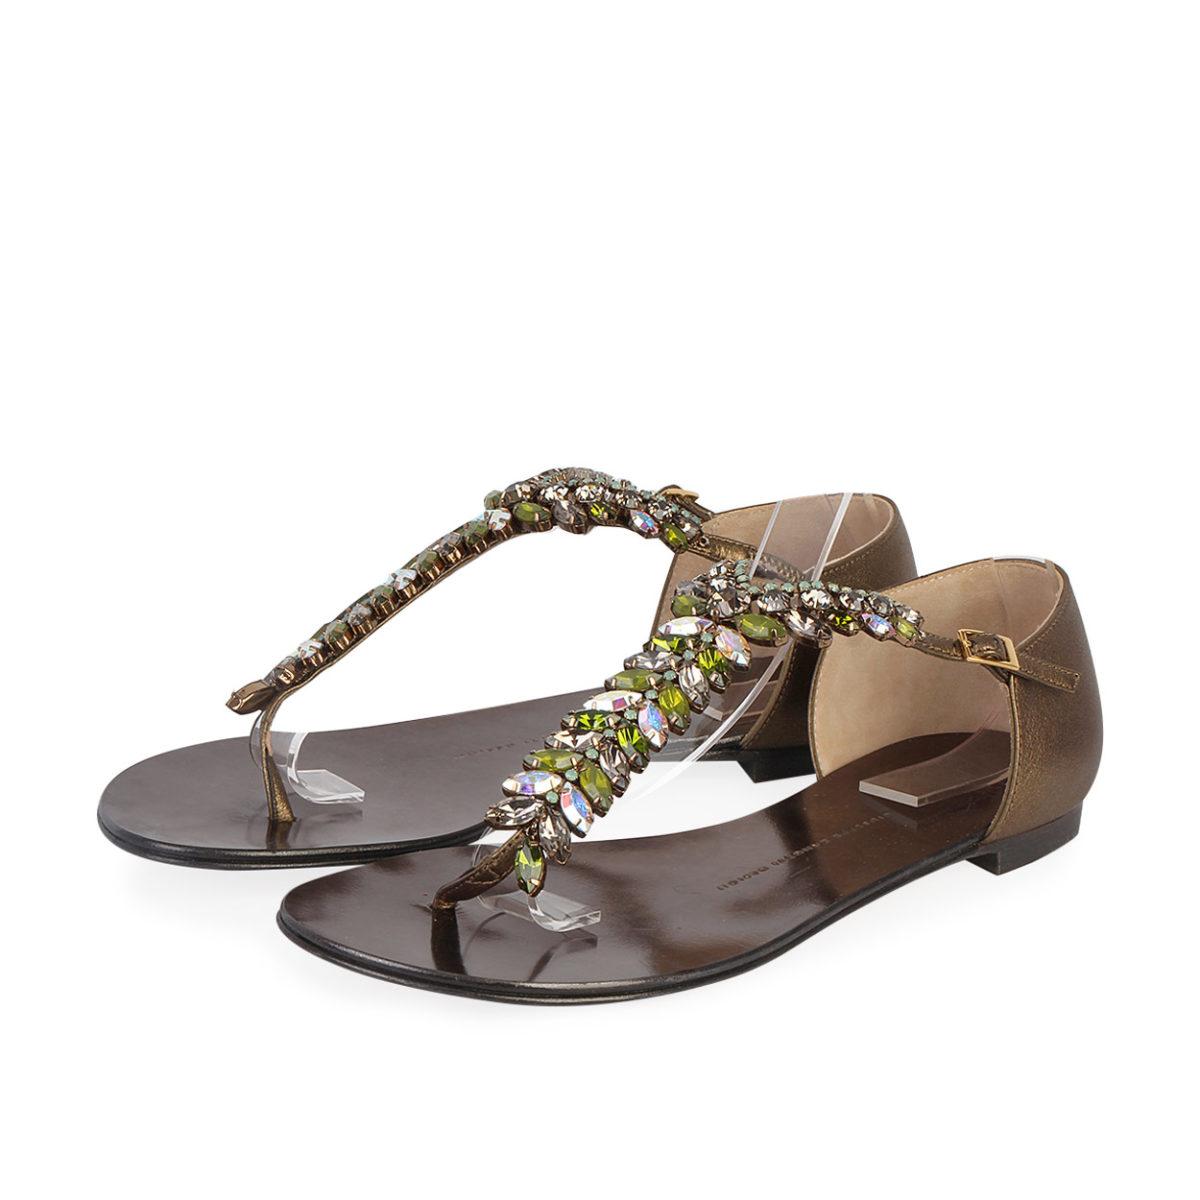 d25b3f4bb893 GIUSEPPE ZANOTTI Metallic Leather Jewel Embellished Flat Sandals - S ...